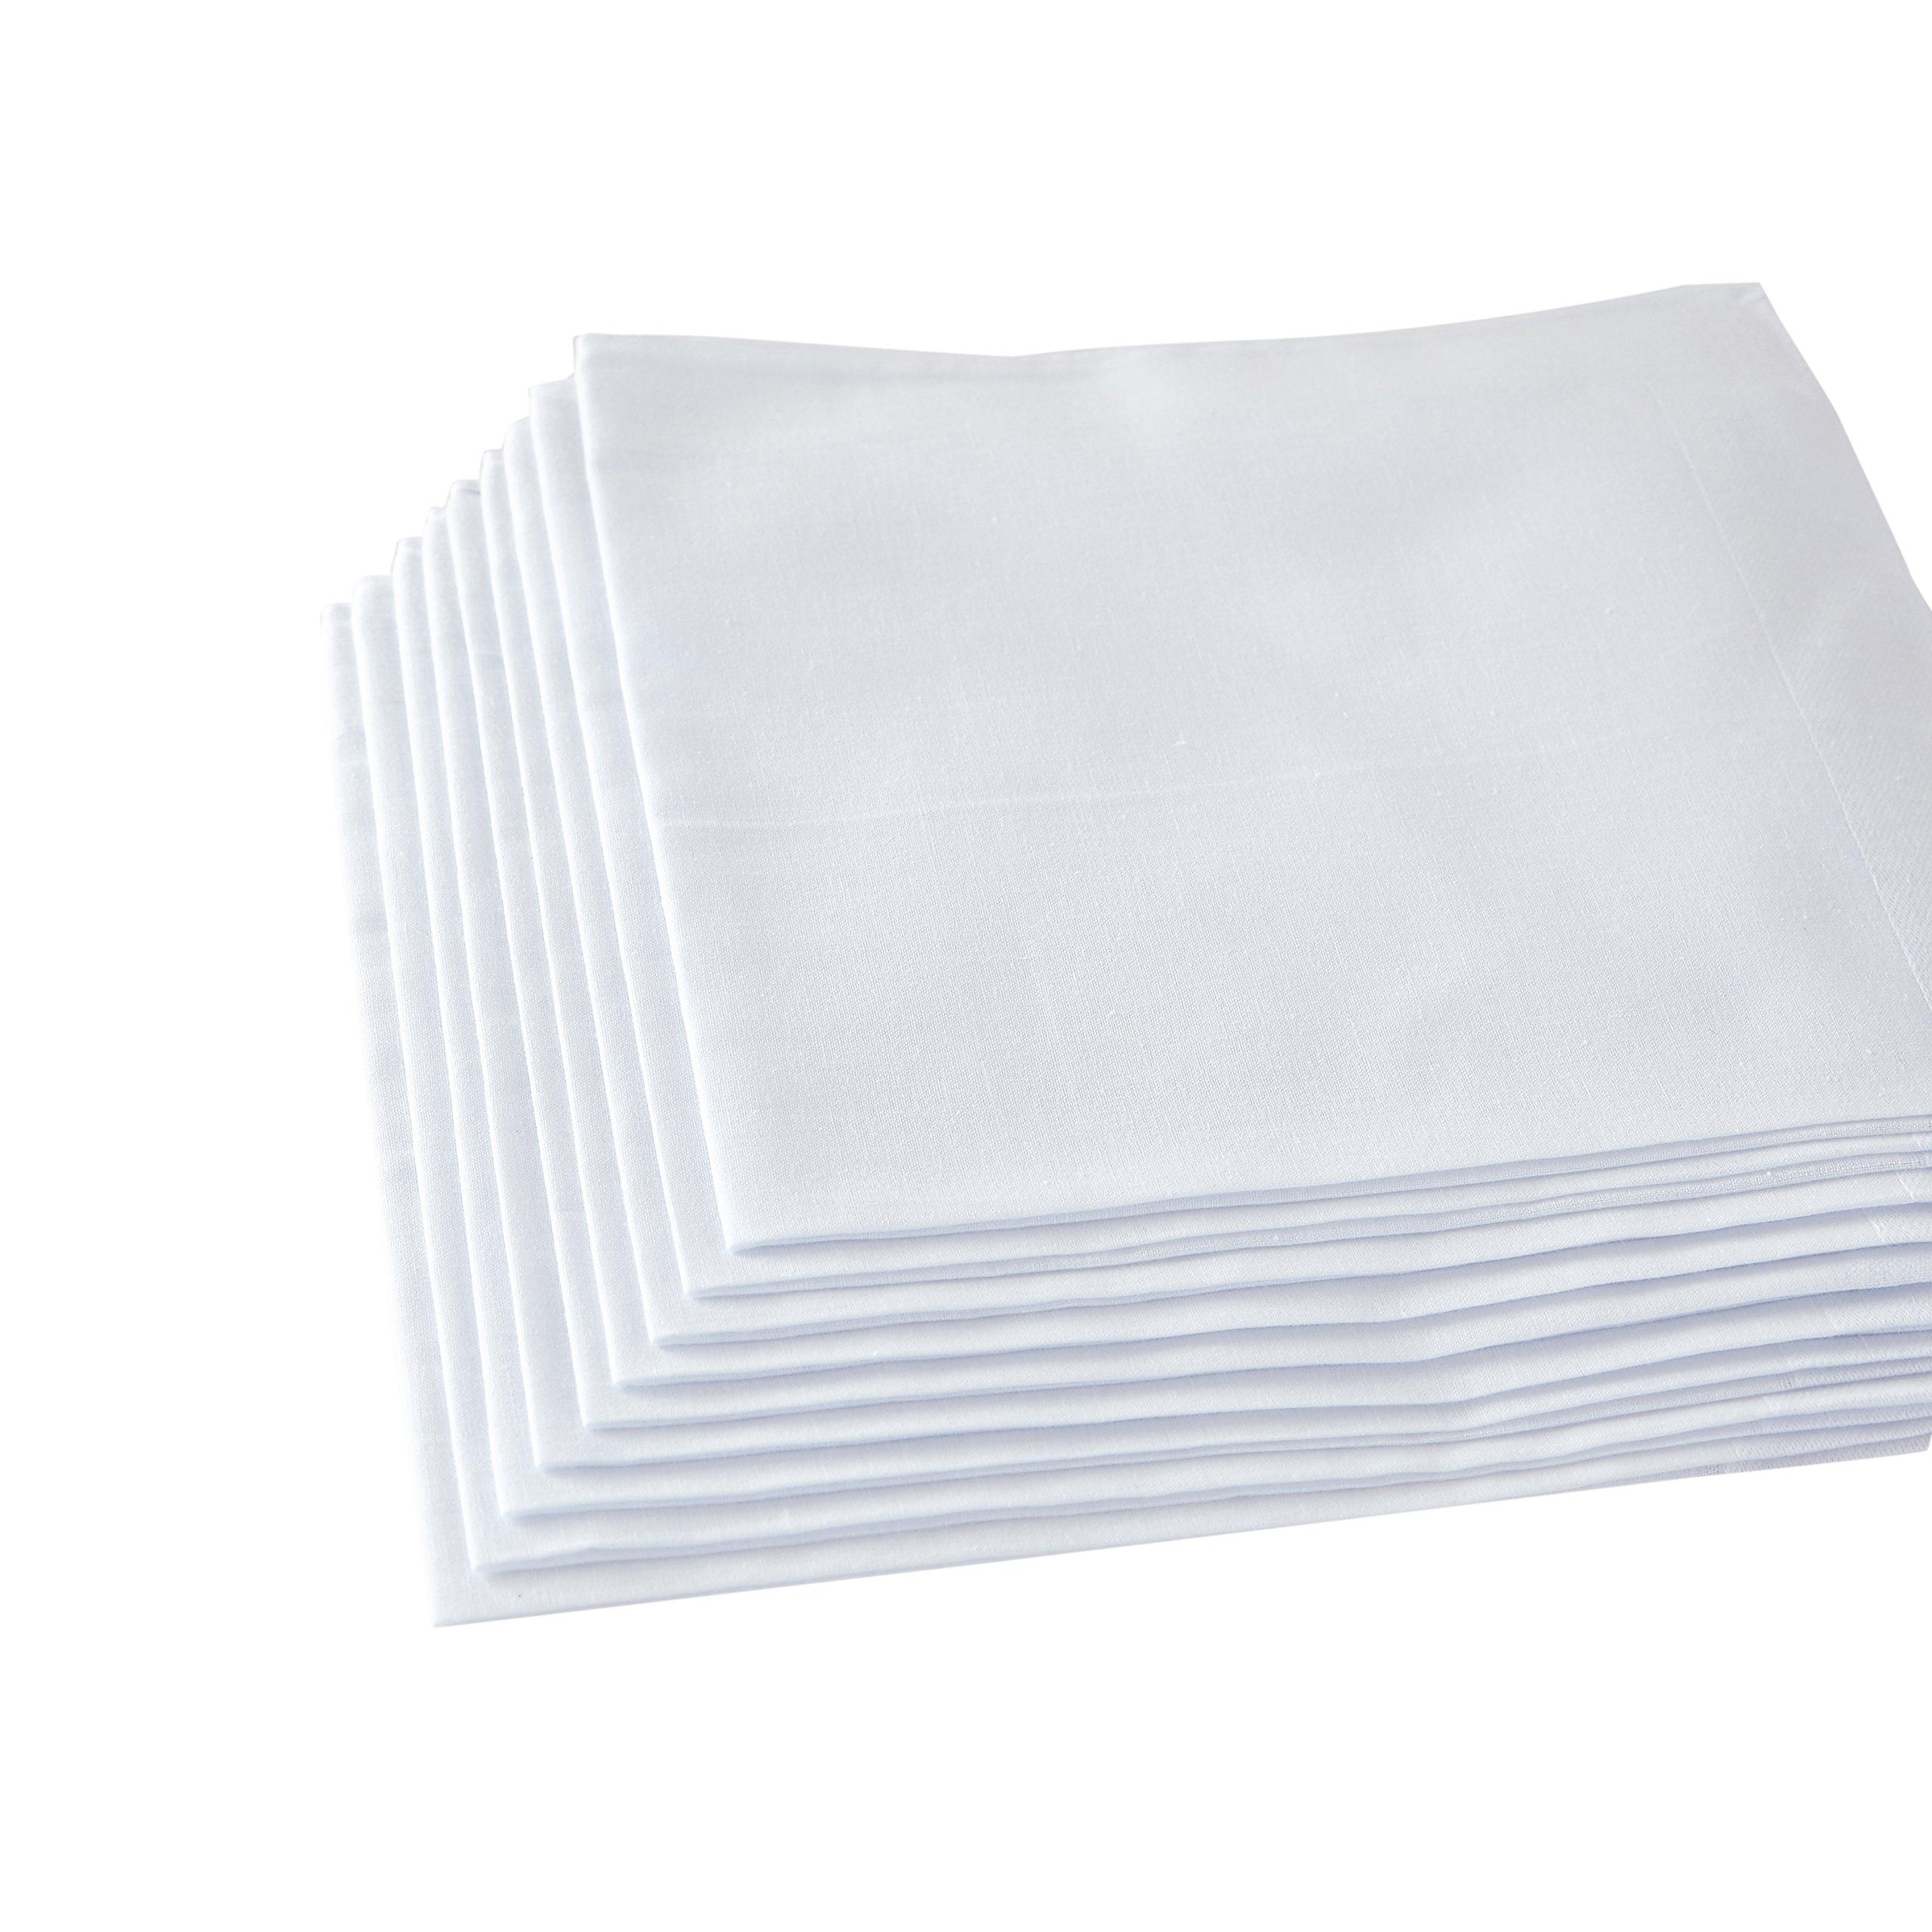 Men's Handkerchiefs,100% Soft Cotton,White Hankie (12 Pieces)